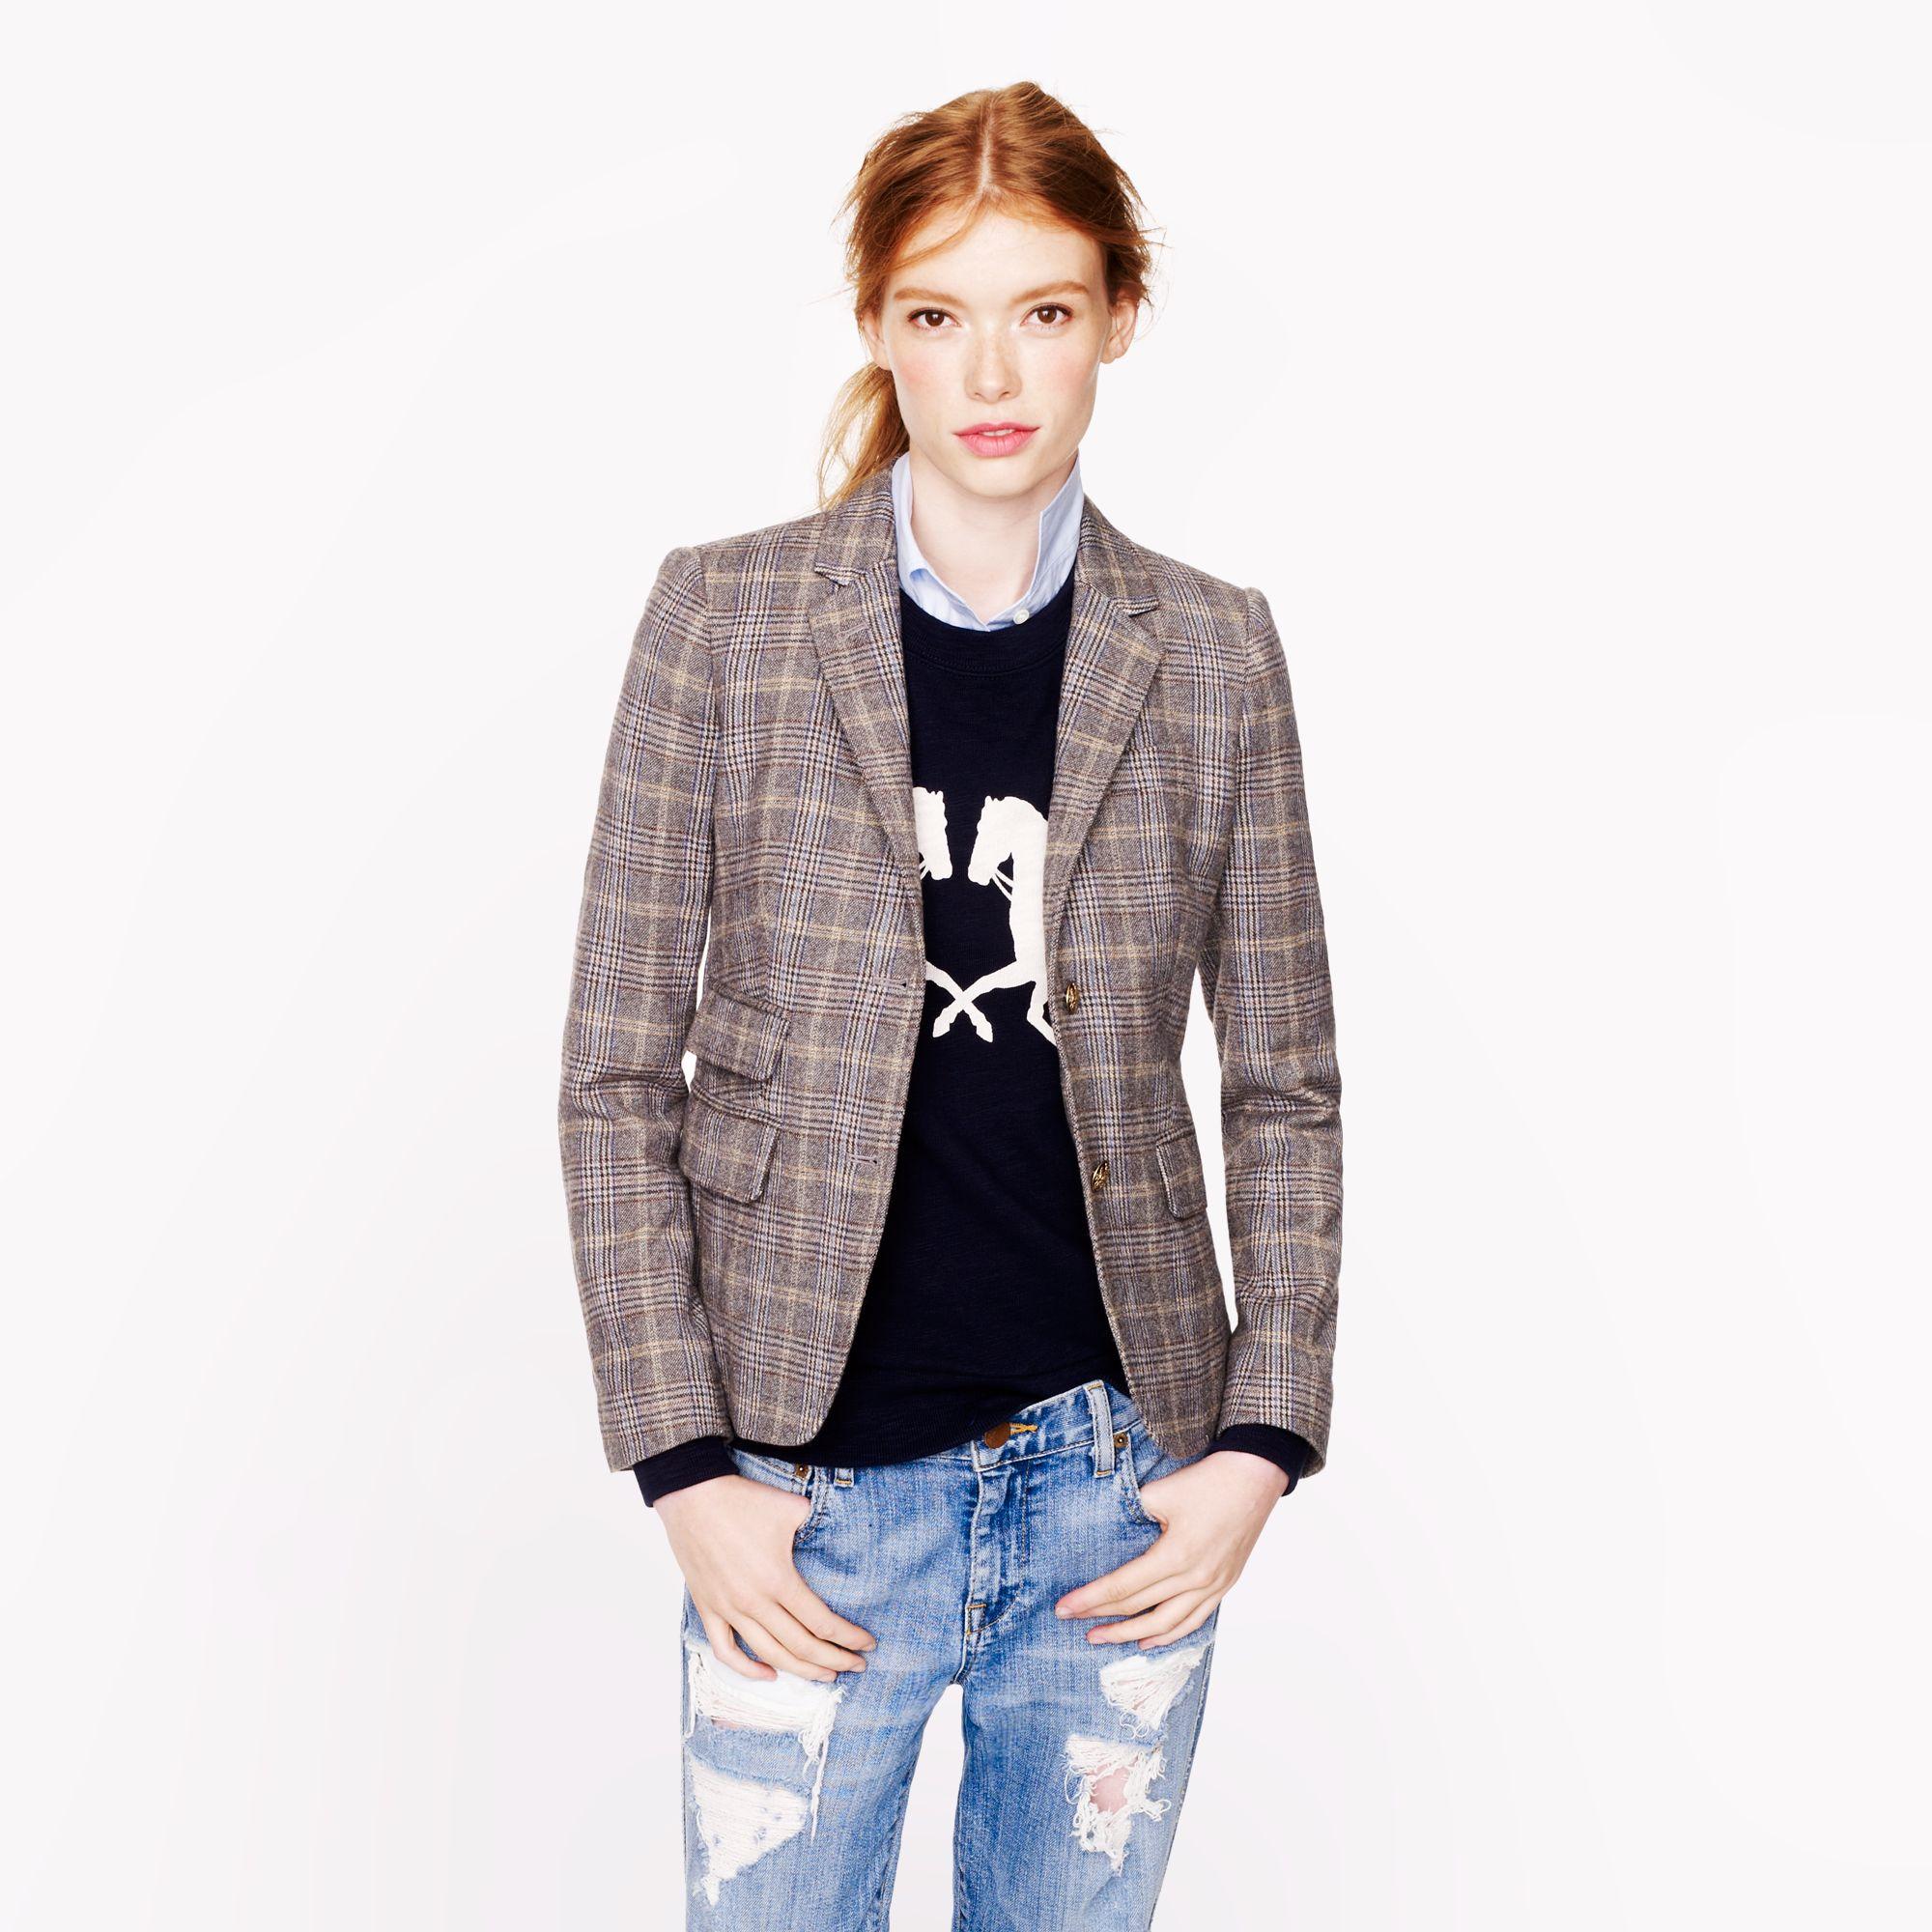 J.crew Petite Schoolboy Blazer in English Tweed in Gray | Lyst